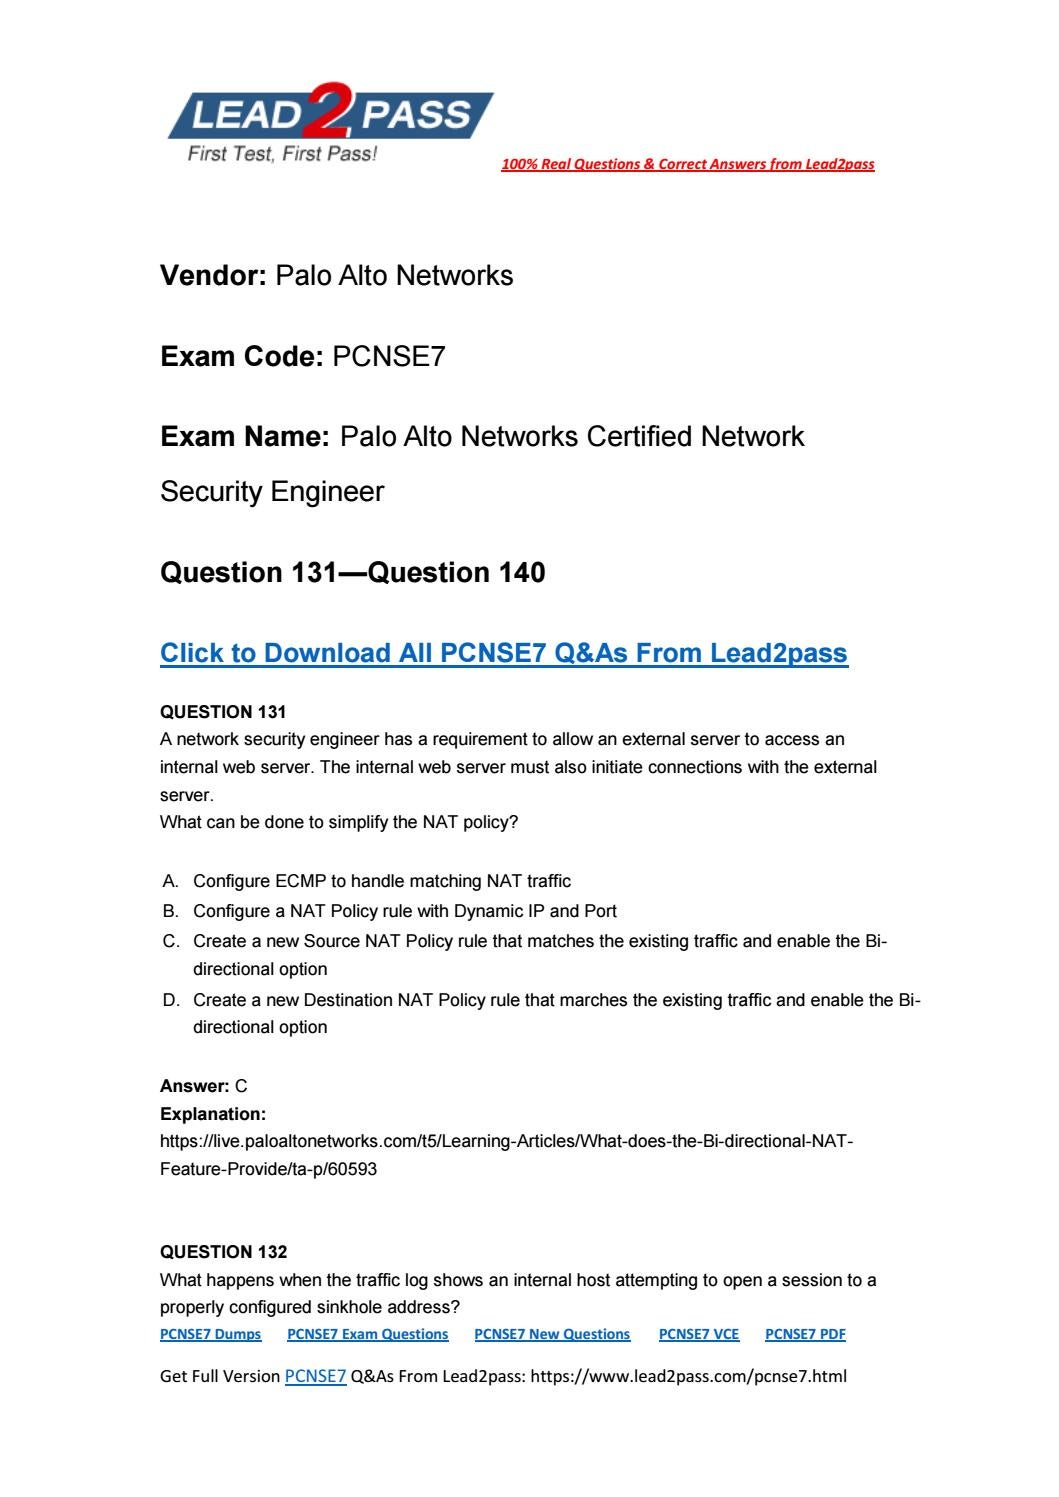 Lead2pass New PCNSE7 Exam PDF (131-140) by magichou1 - issuu